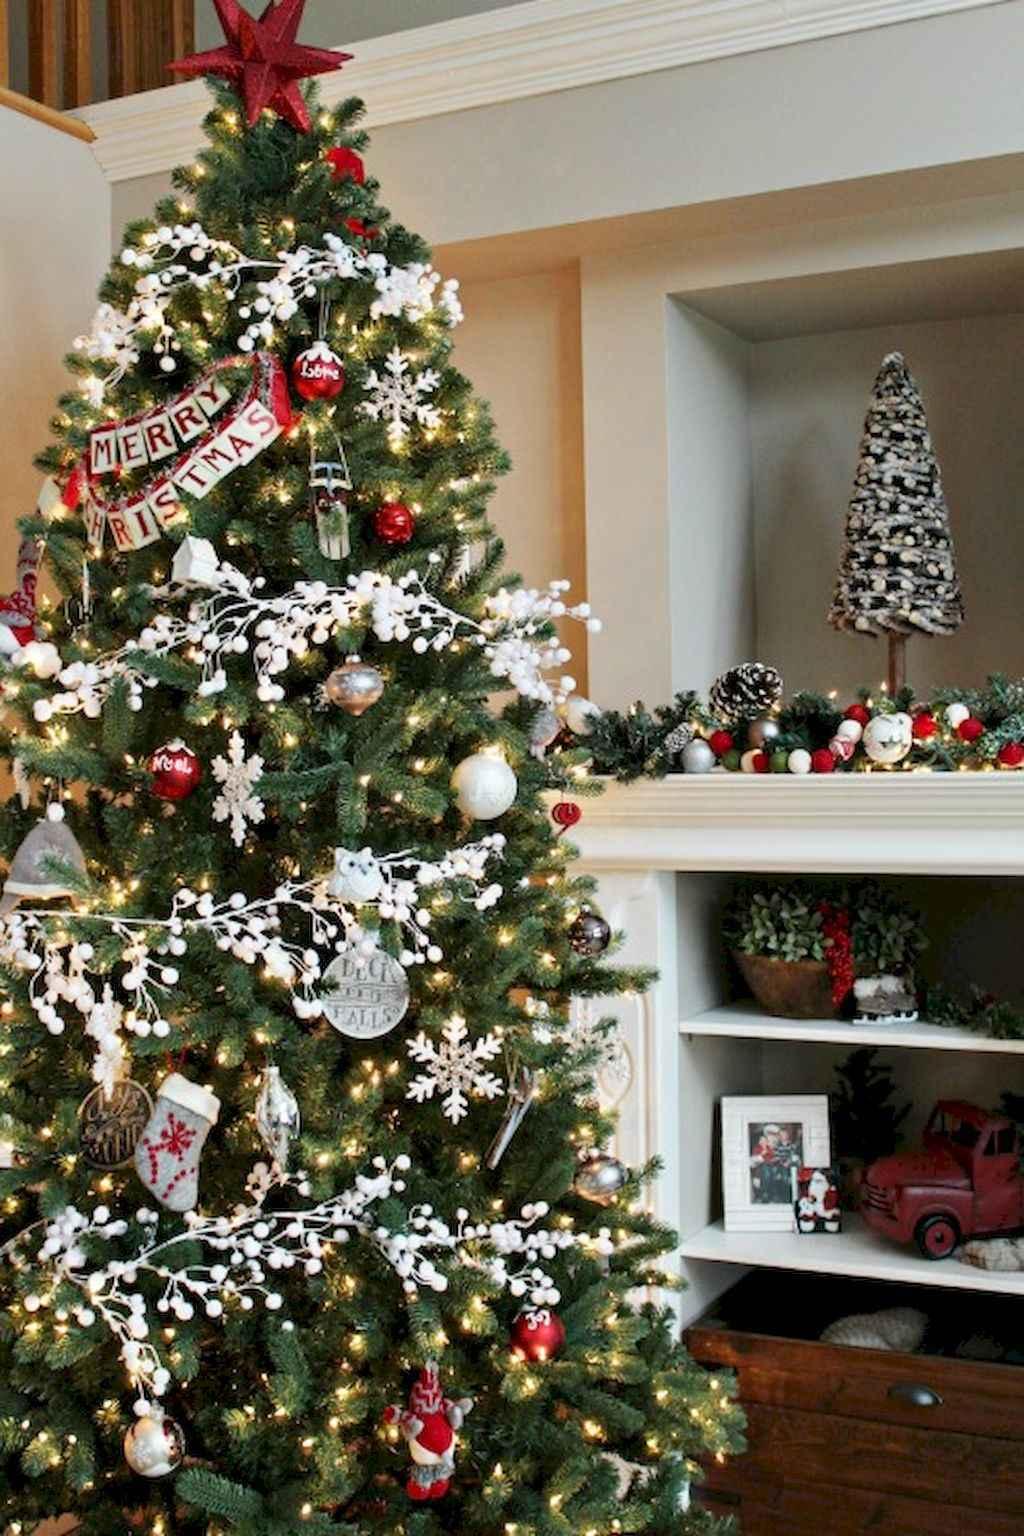 100 beautiful christmas tree decorations ideas (33